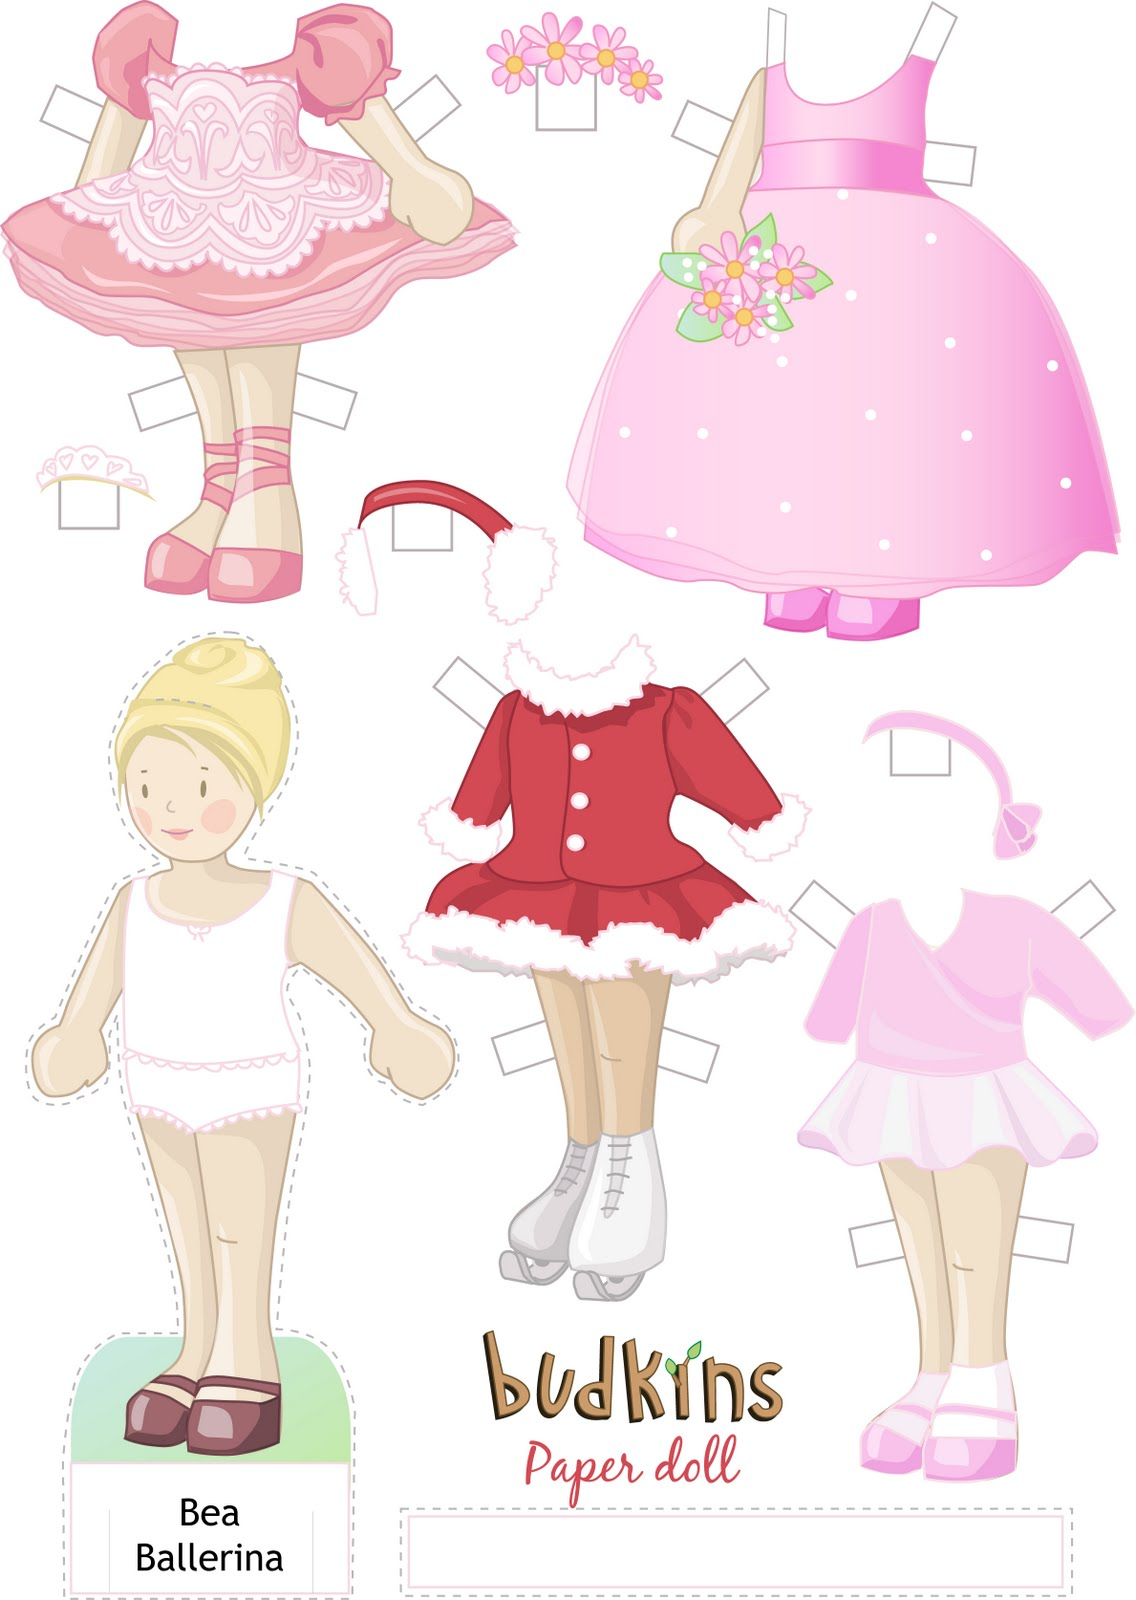 Bea Budkins Paper Doll